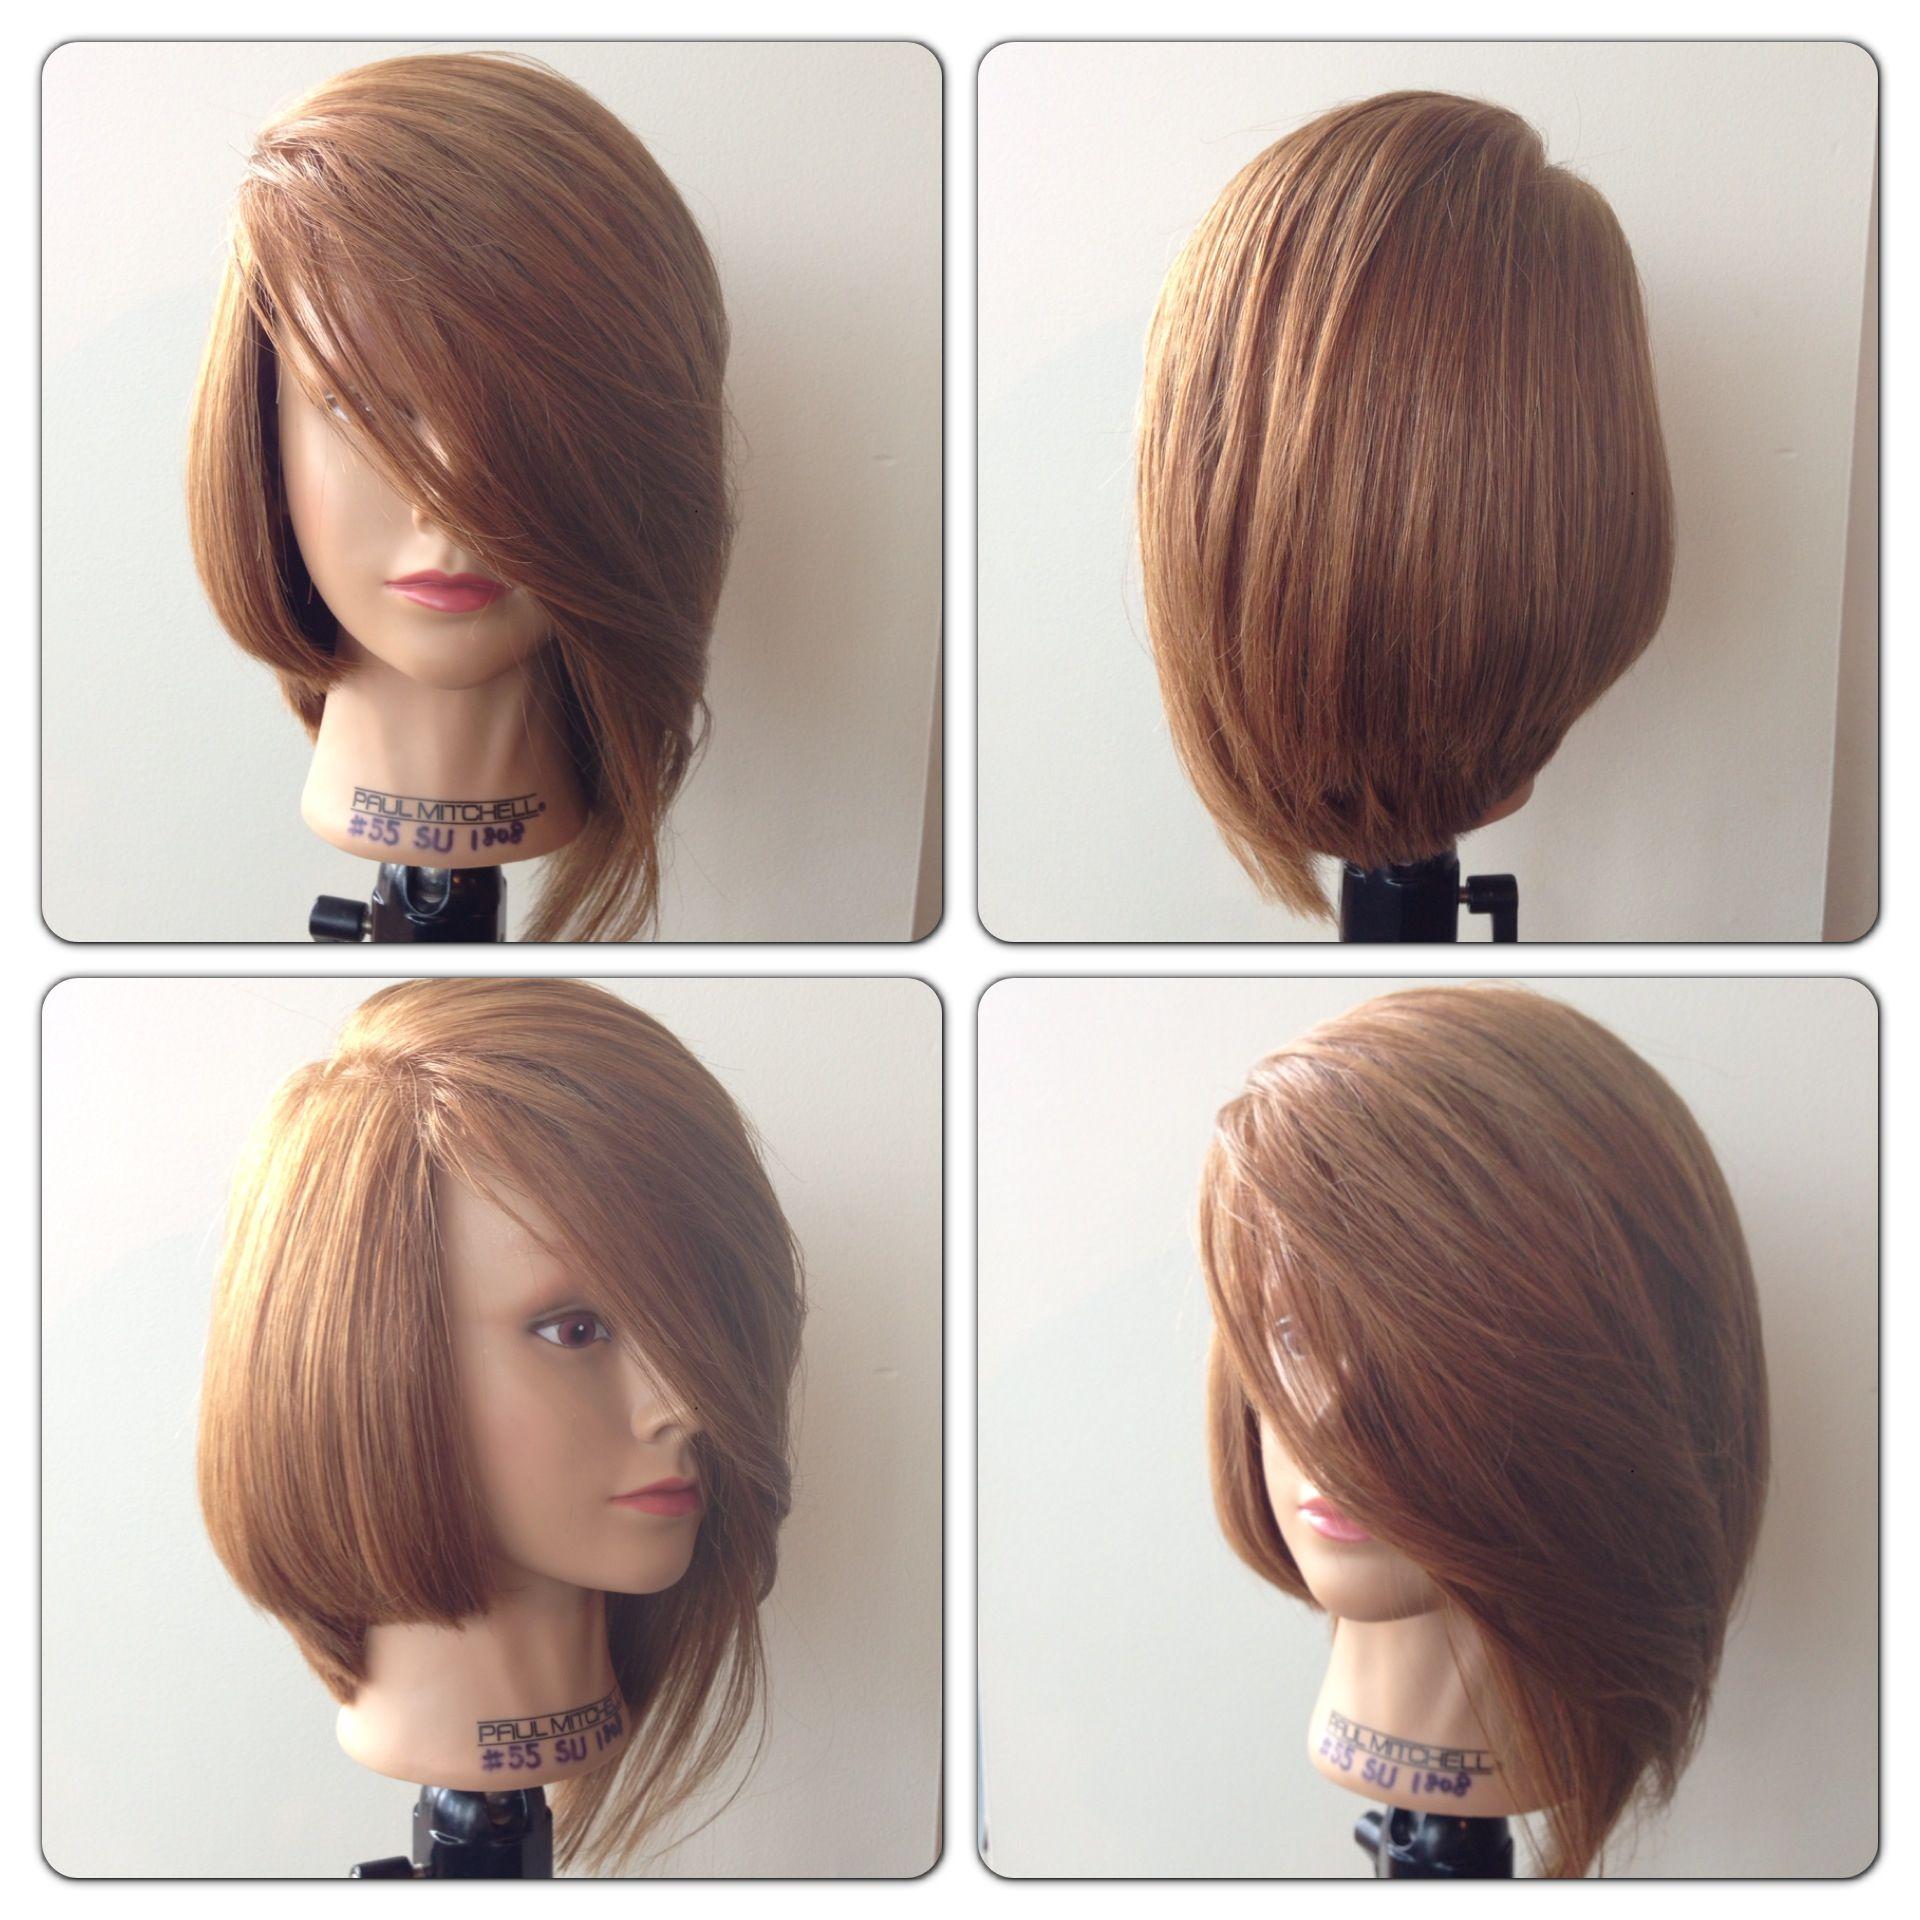 Graduation Hairstyles Medium Hair: Pin On Hair Cut Studio 2013